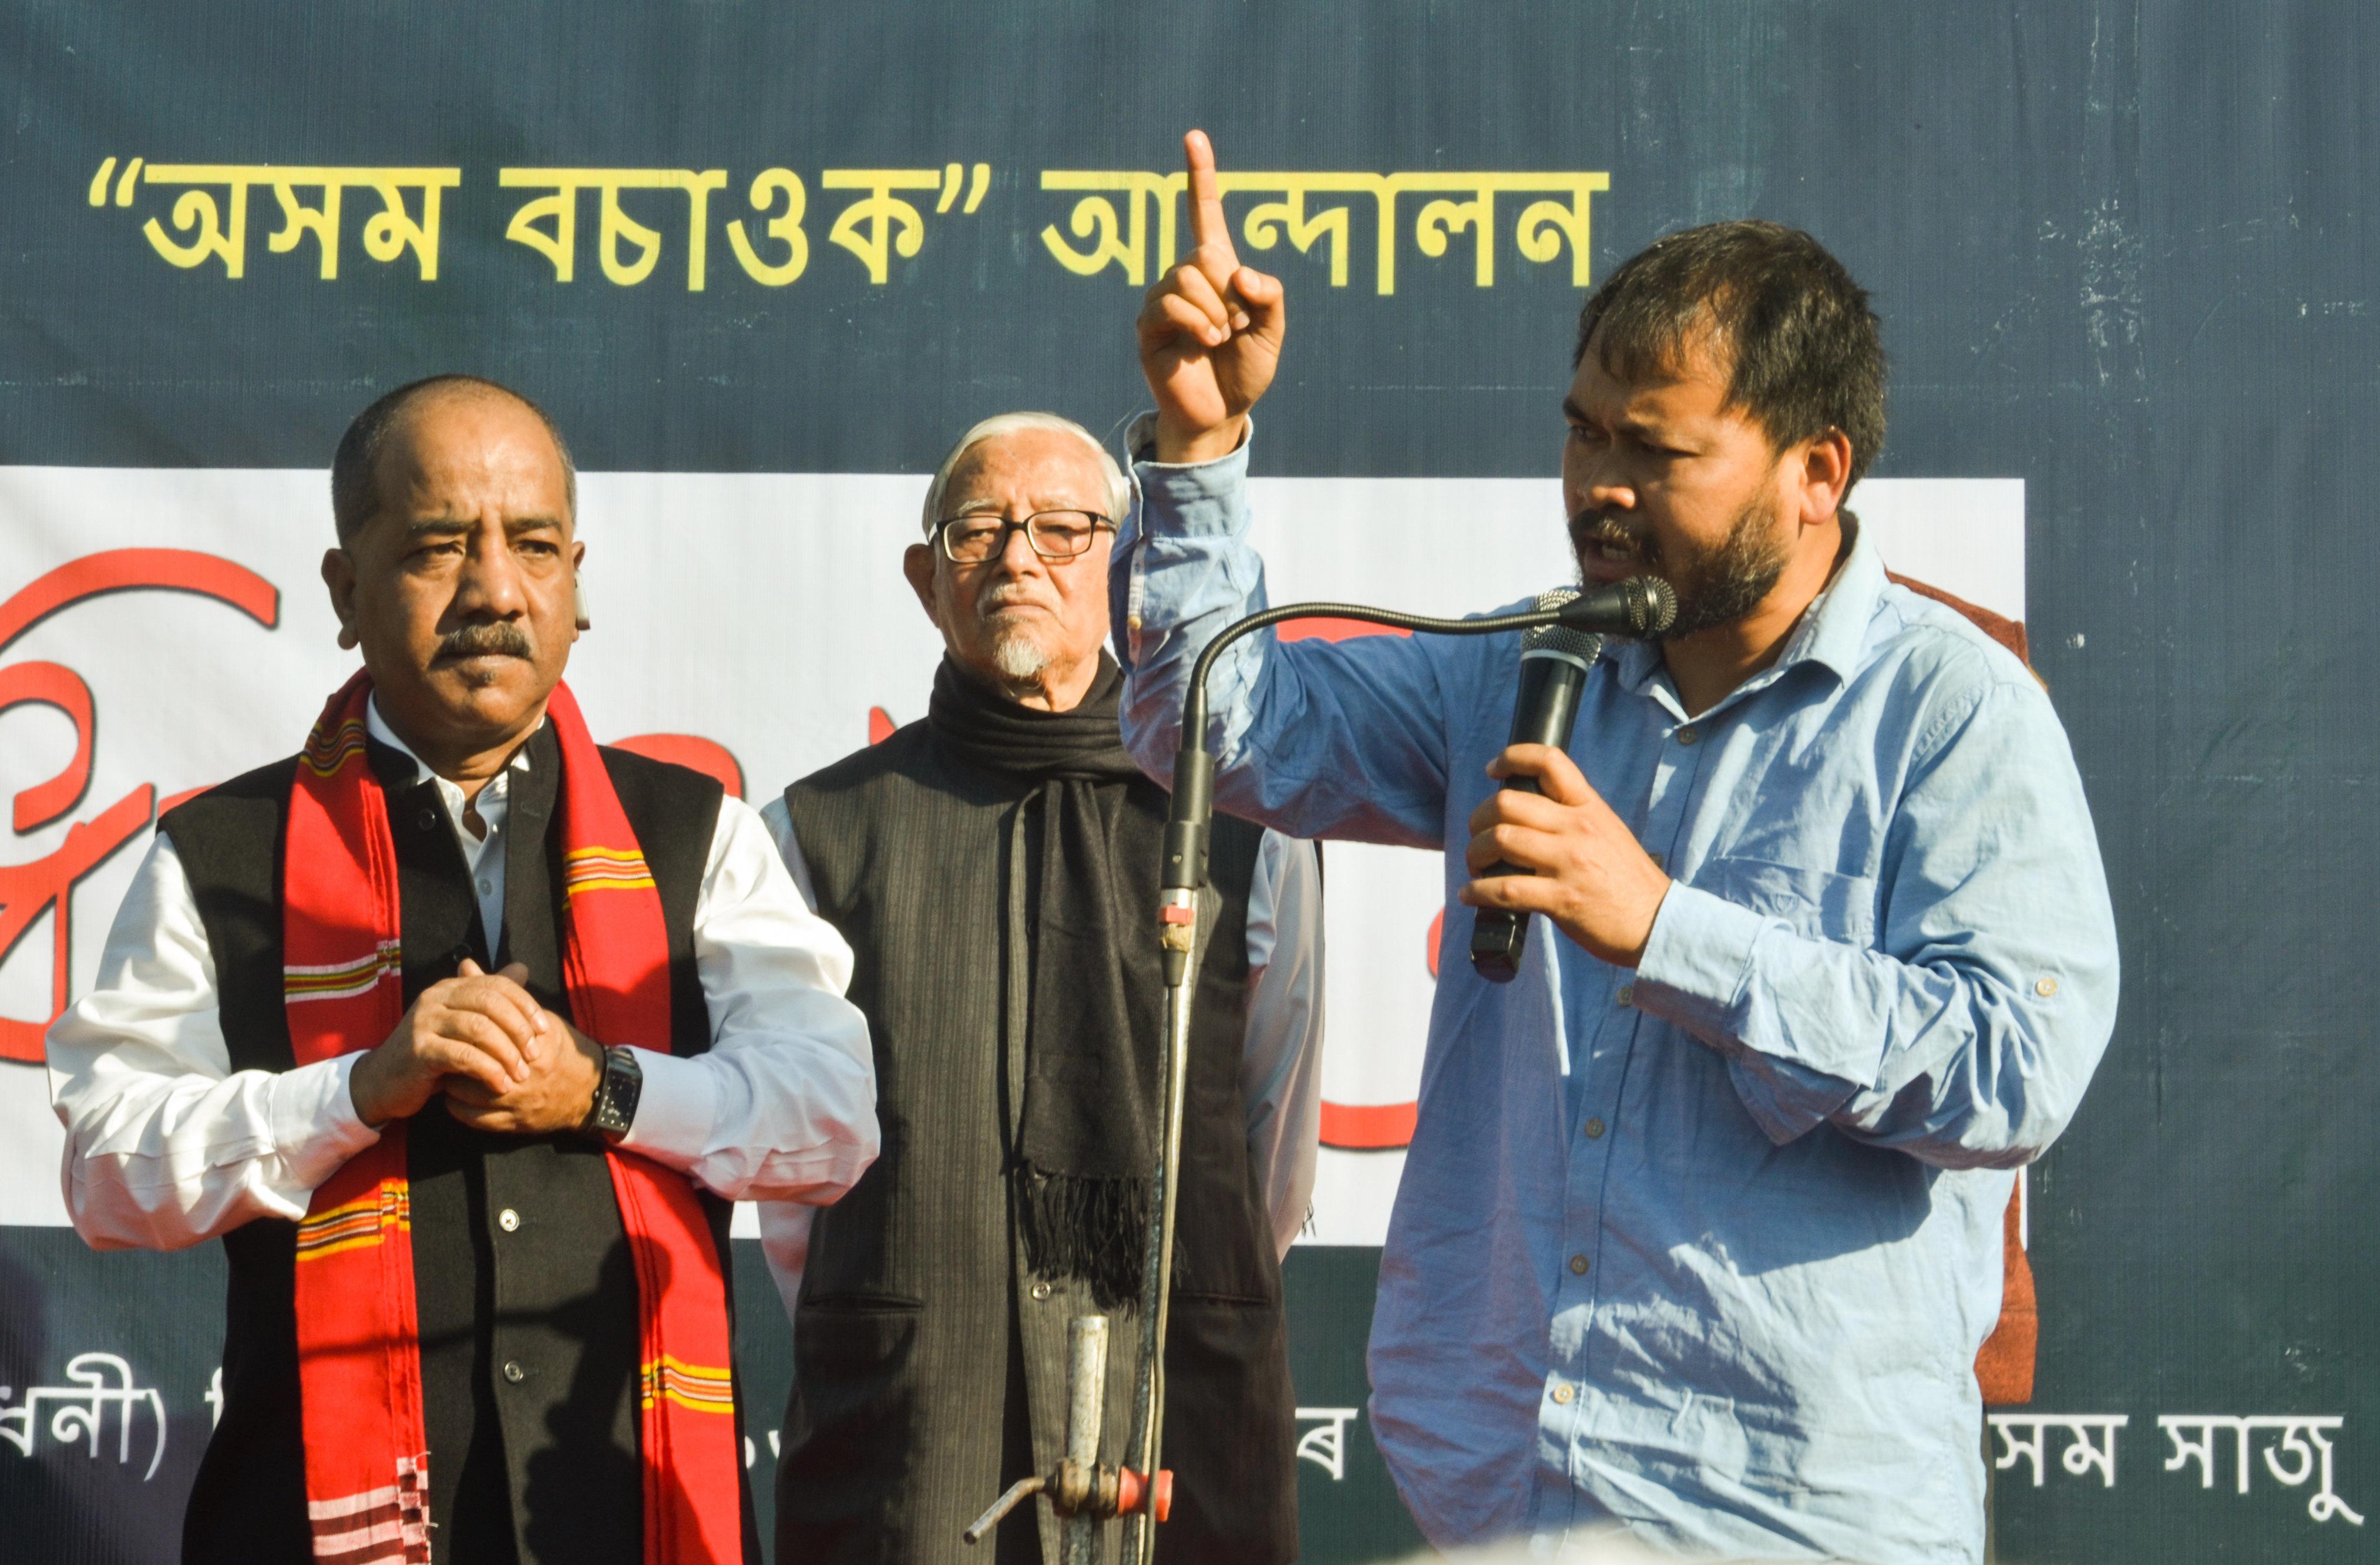 Academic Hiren Gohain, peasant leader Akhil Gogoi and journalist Manjit Mahanta during a protest in